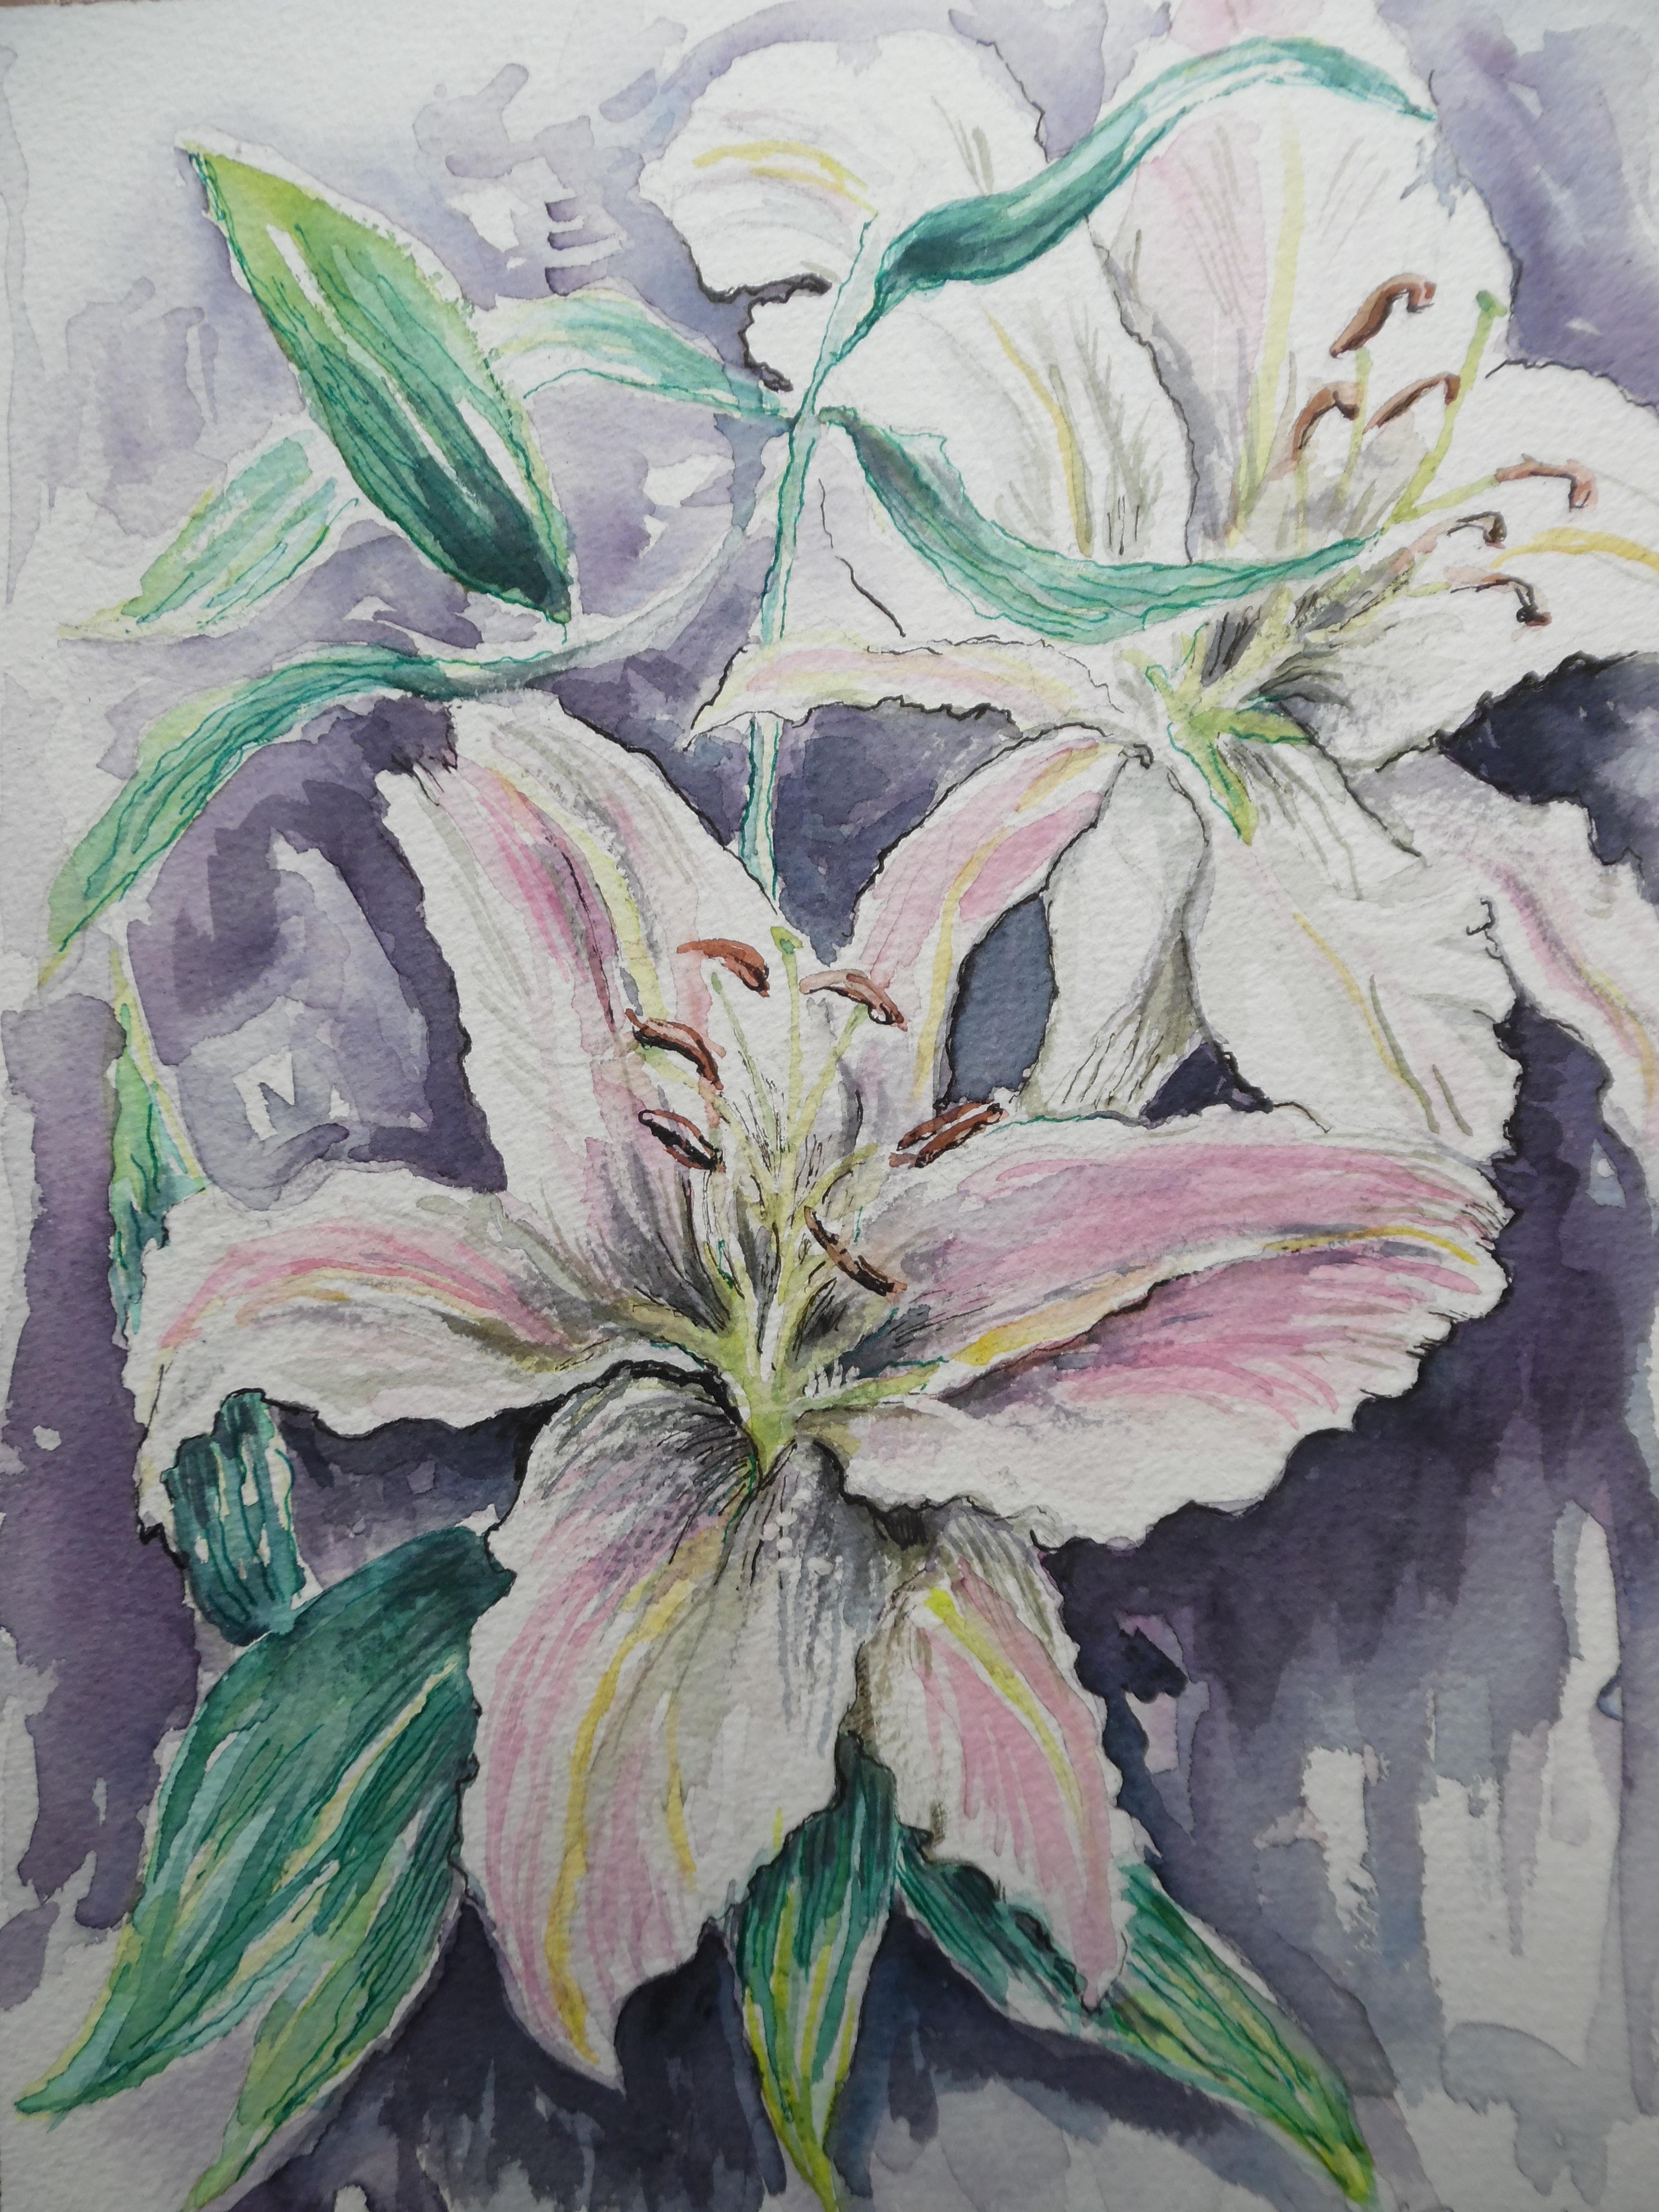 Flower-Blumen-Watercolour-Aquarell-Nadia-Baumgart